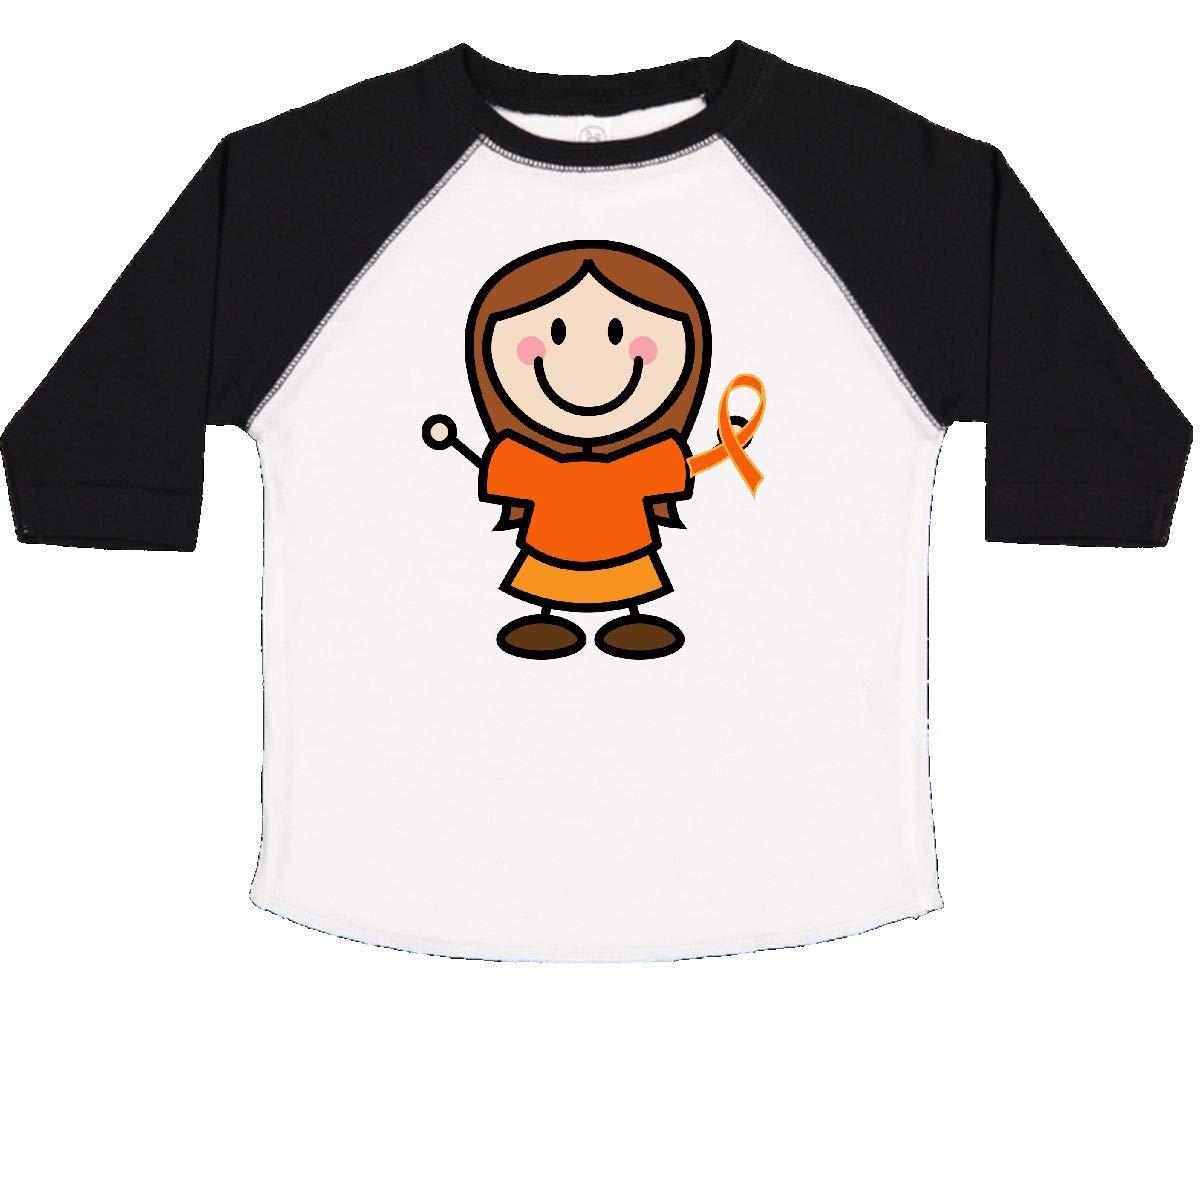 inktastic Orange Ribbon Stick Figure Toddler T-Shirt